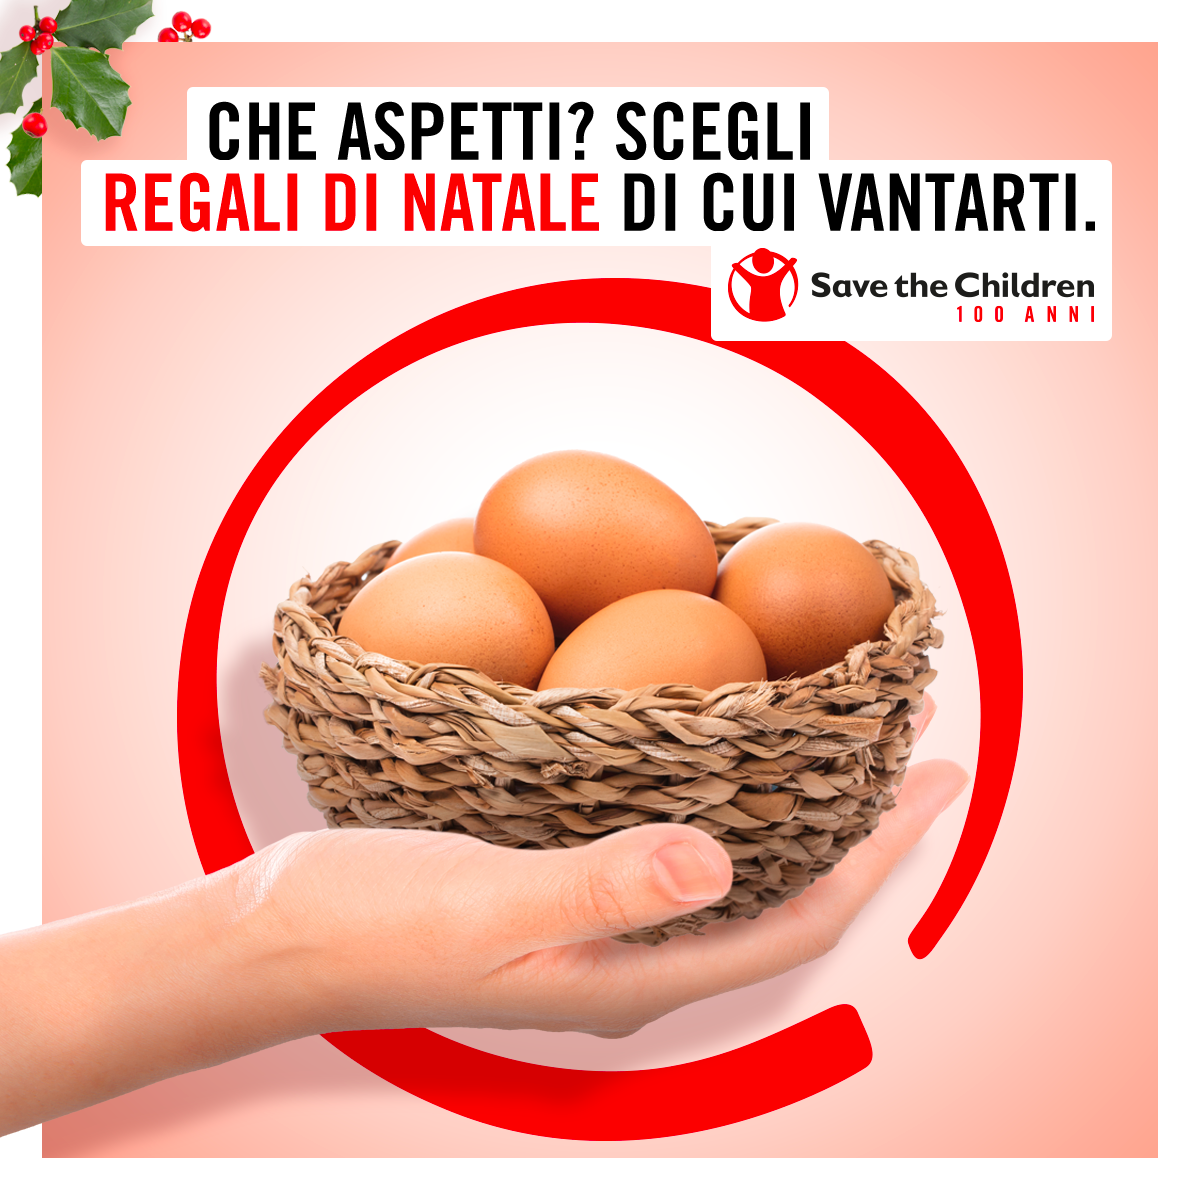 Save The Children Regali Di Natale.Agenzia Social Media Save The Children Kirweb